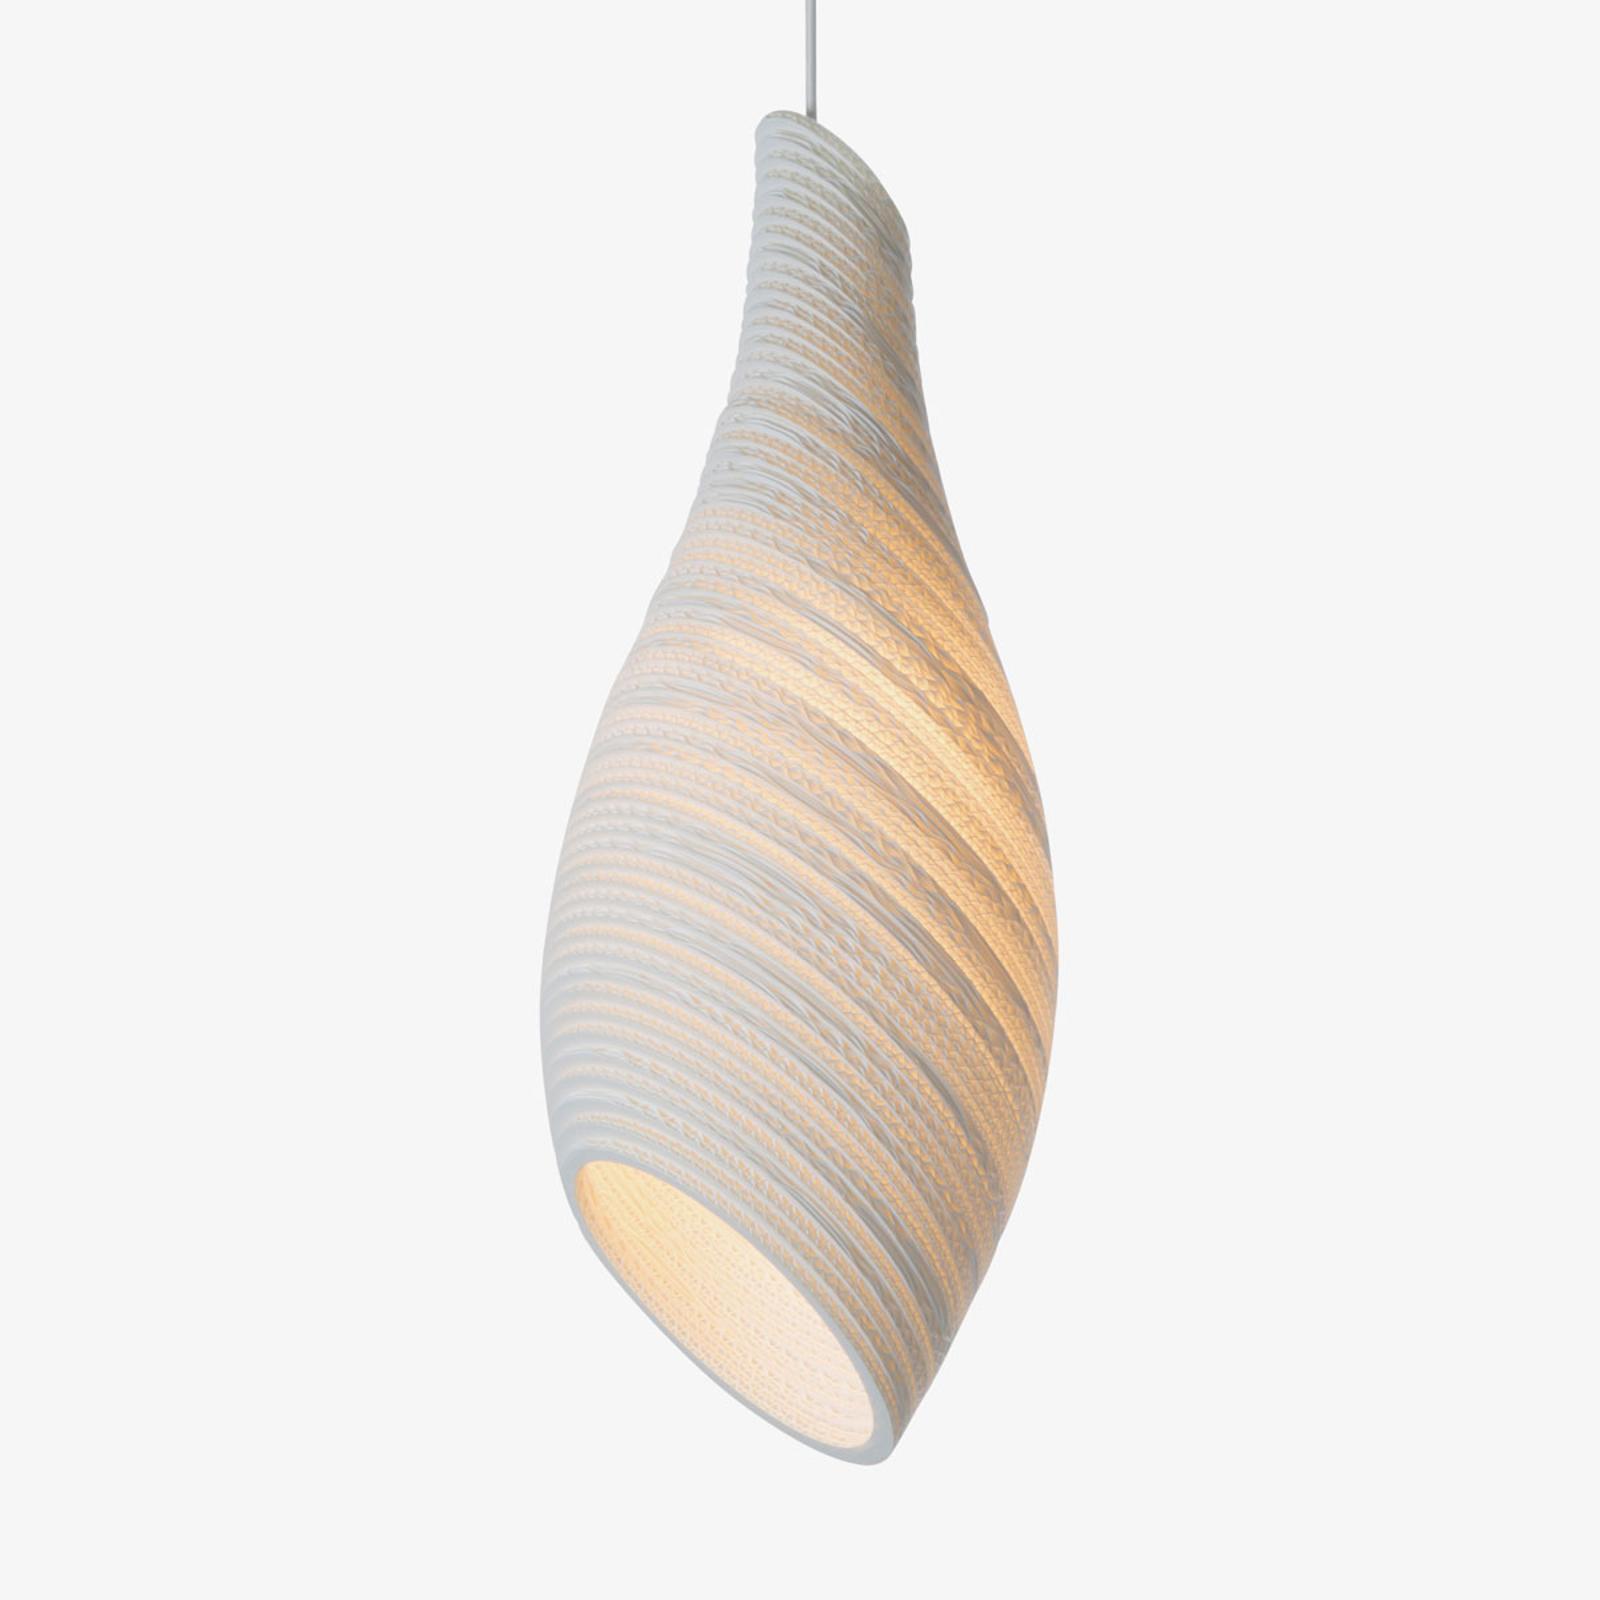 Hanglamp Nest24, wit